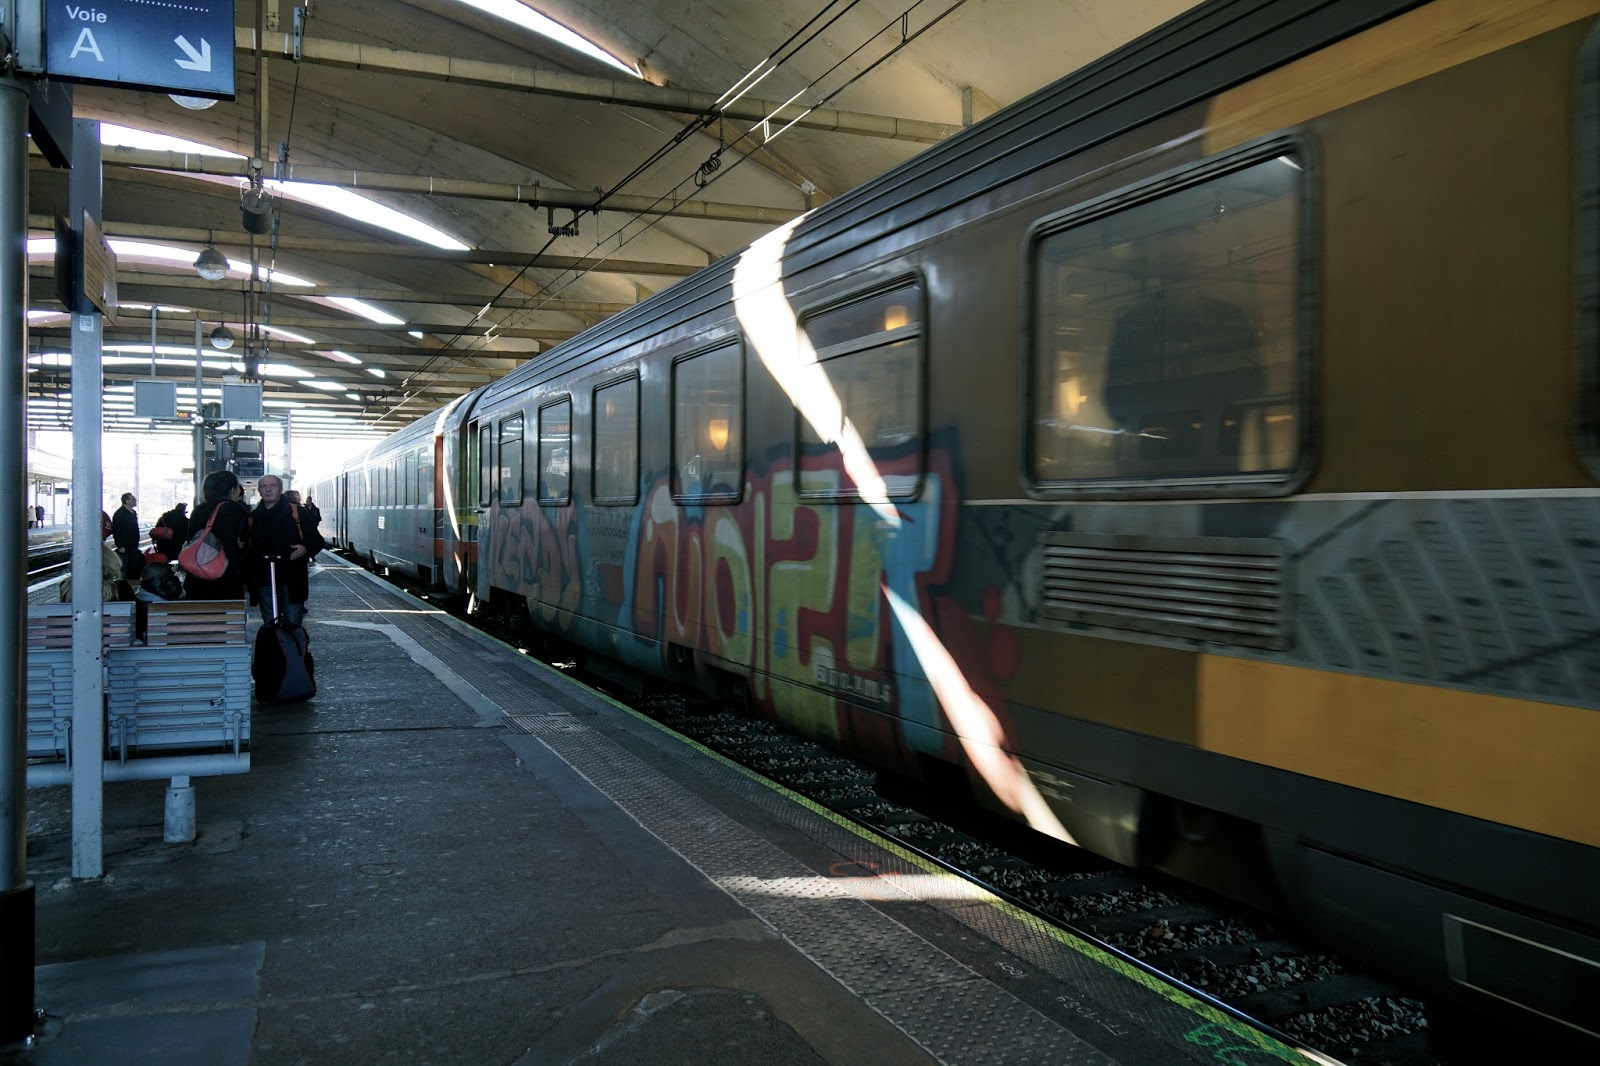 ニーム駅(Gare de Nîmes)